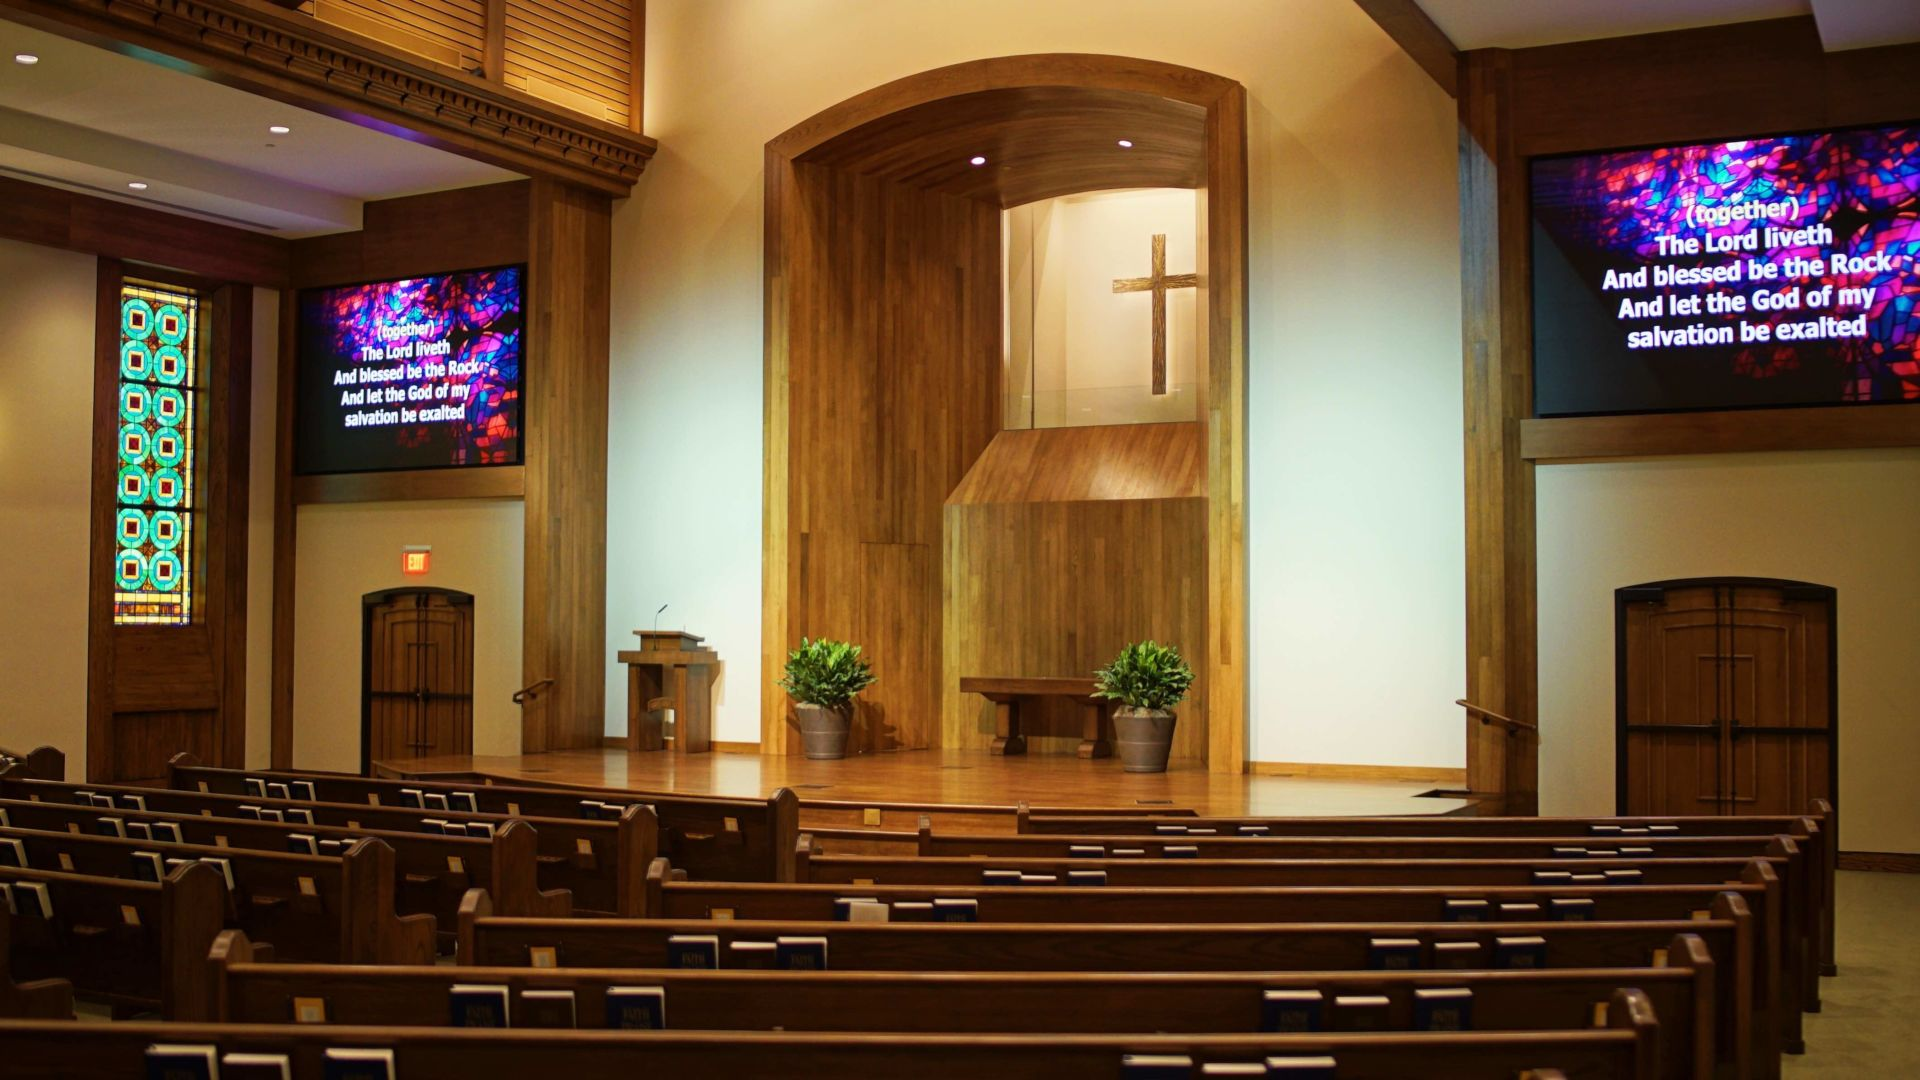 Preston-Road-Church-Of-Christ-Renovation-Church-Video-Screens